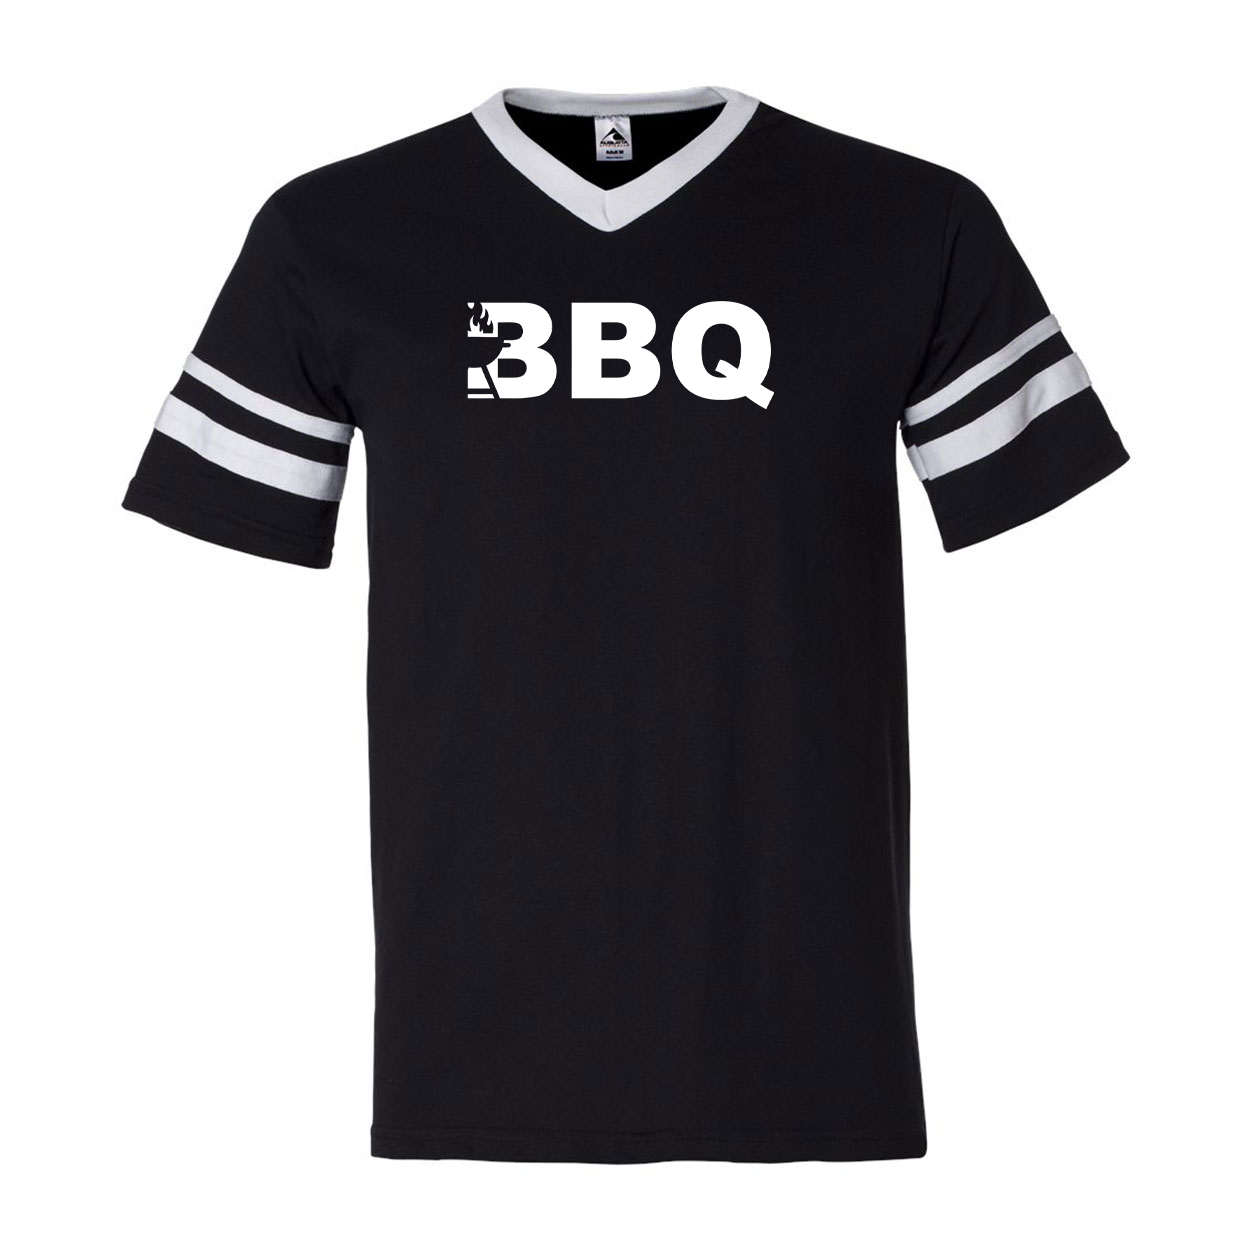 BBQ Grill Logo Classic Premium Striped Jersey T-Shirt Black/White (White Logo)